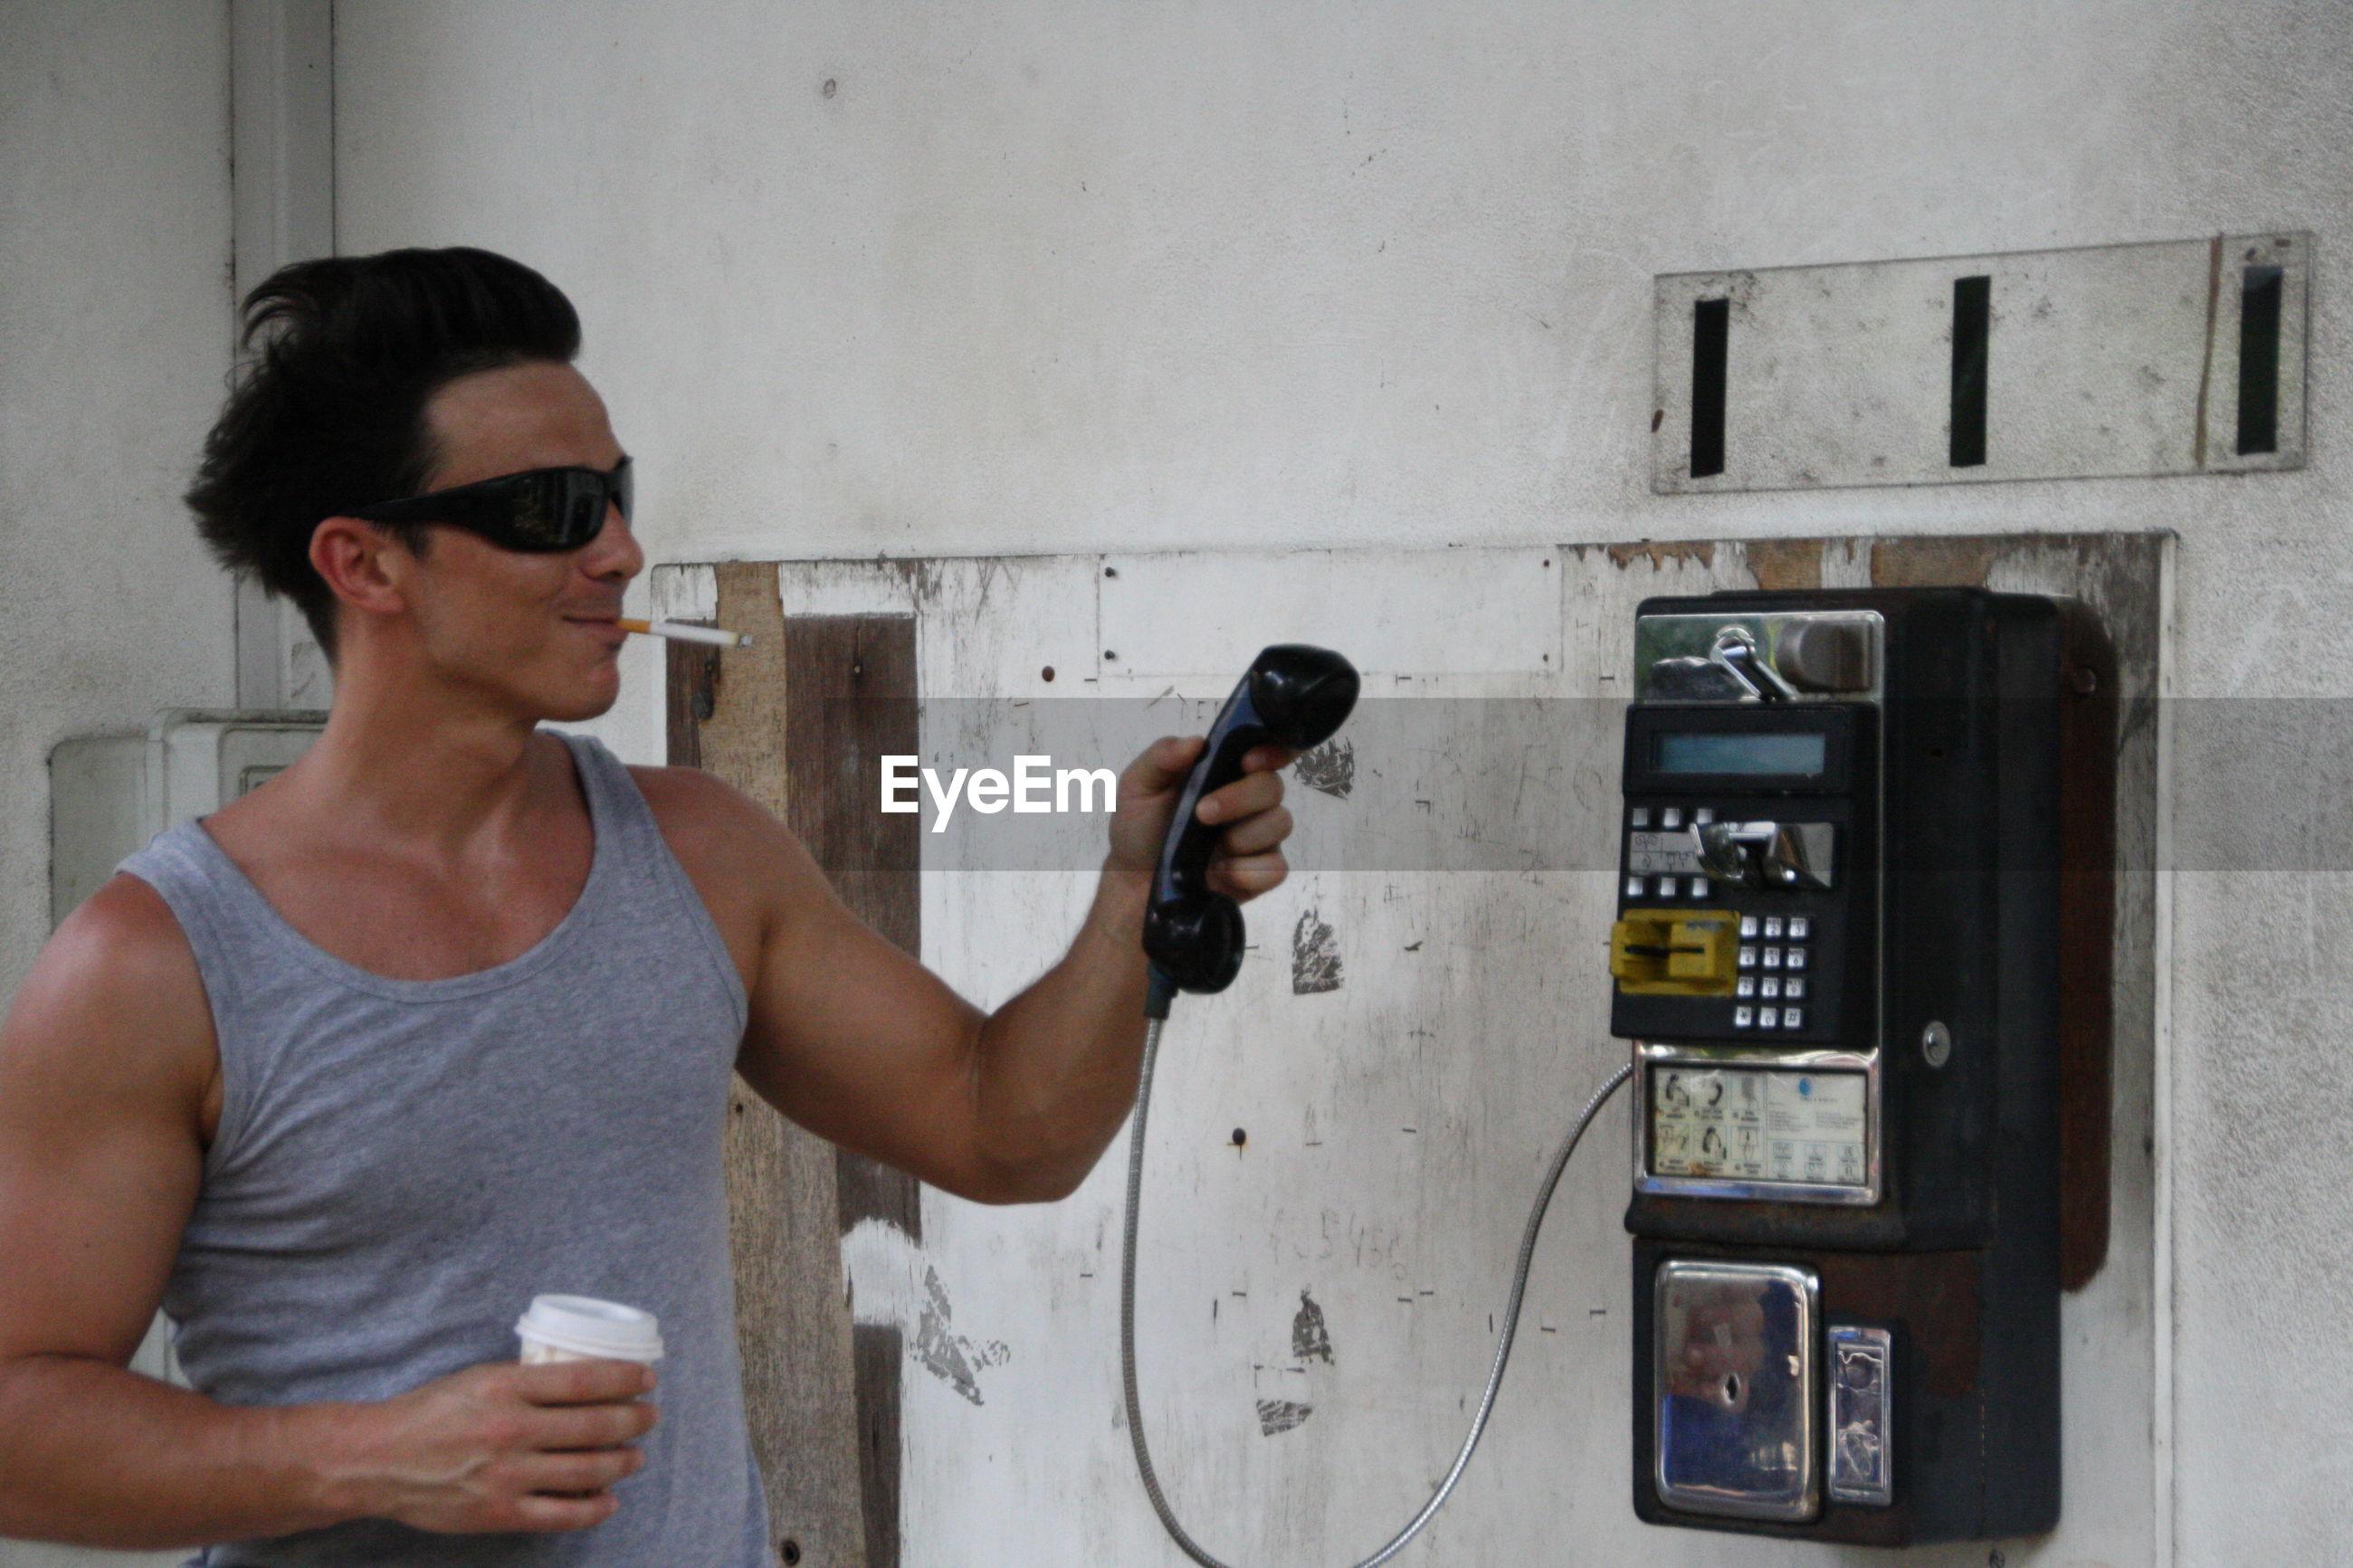 Man using payphone